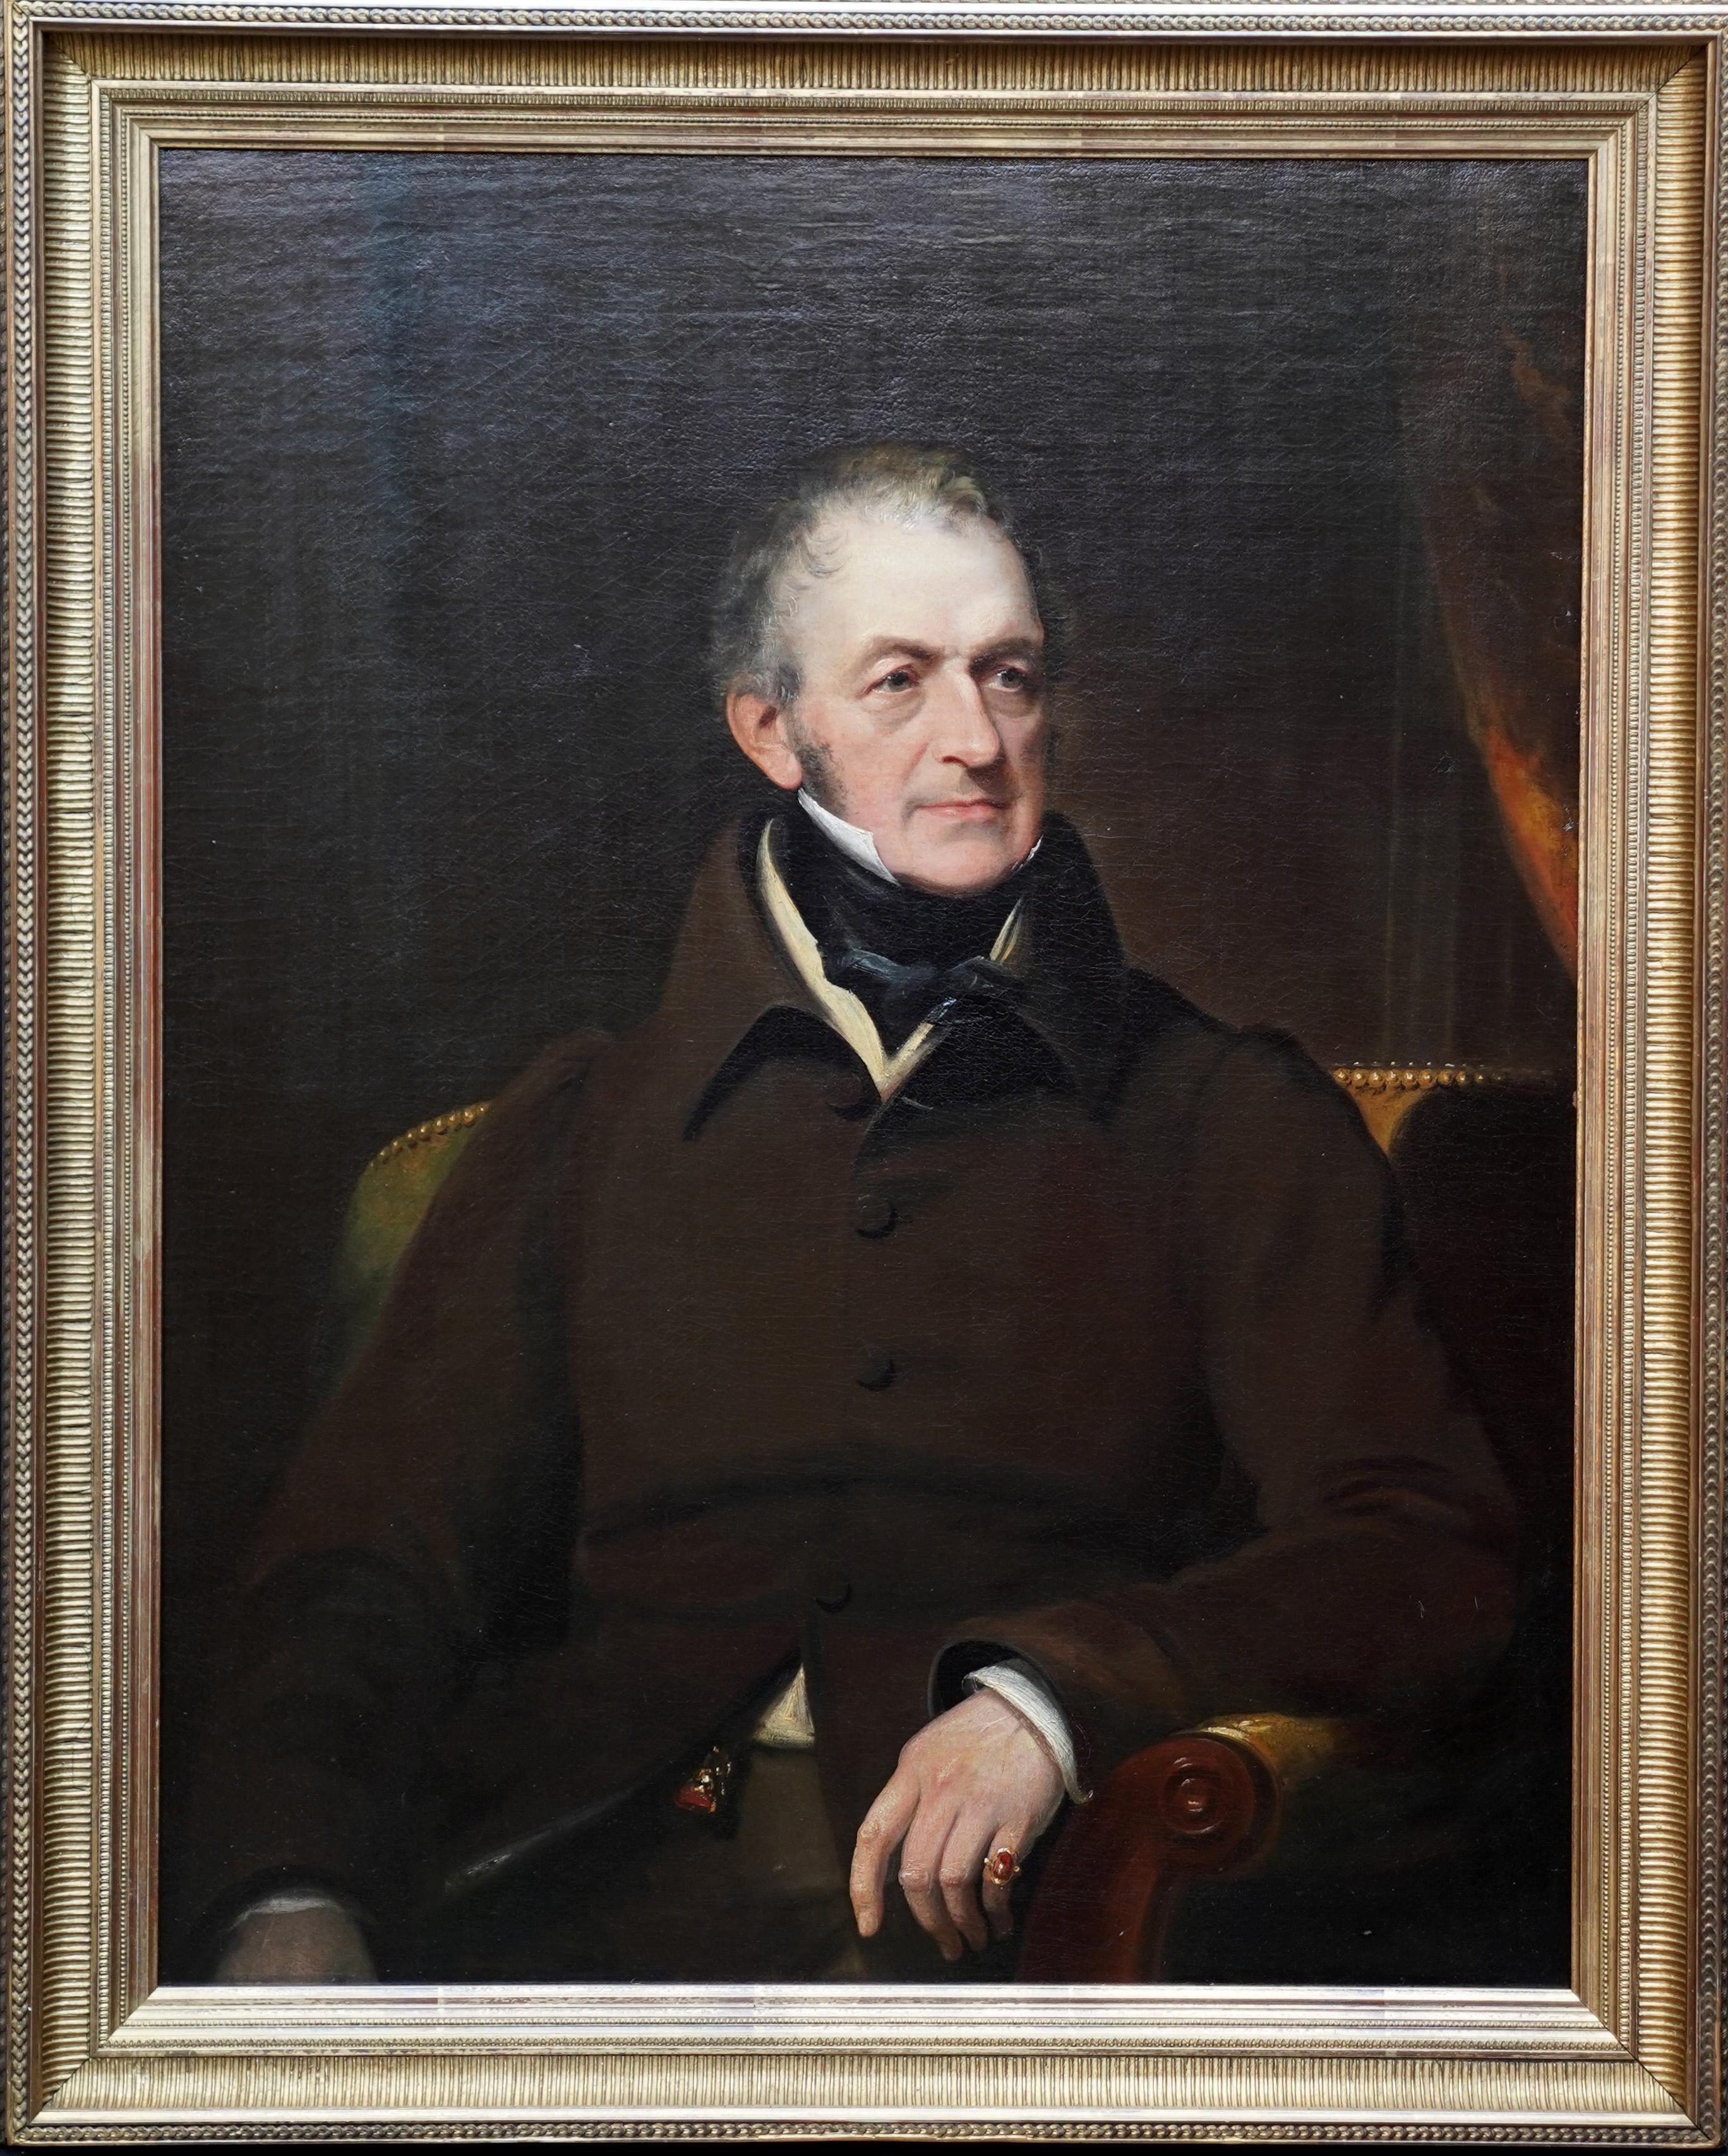 Portrait of a Seated Gentleman - British 19th century art portrait oil painting